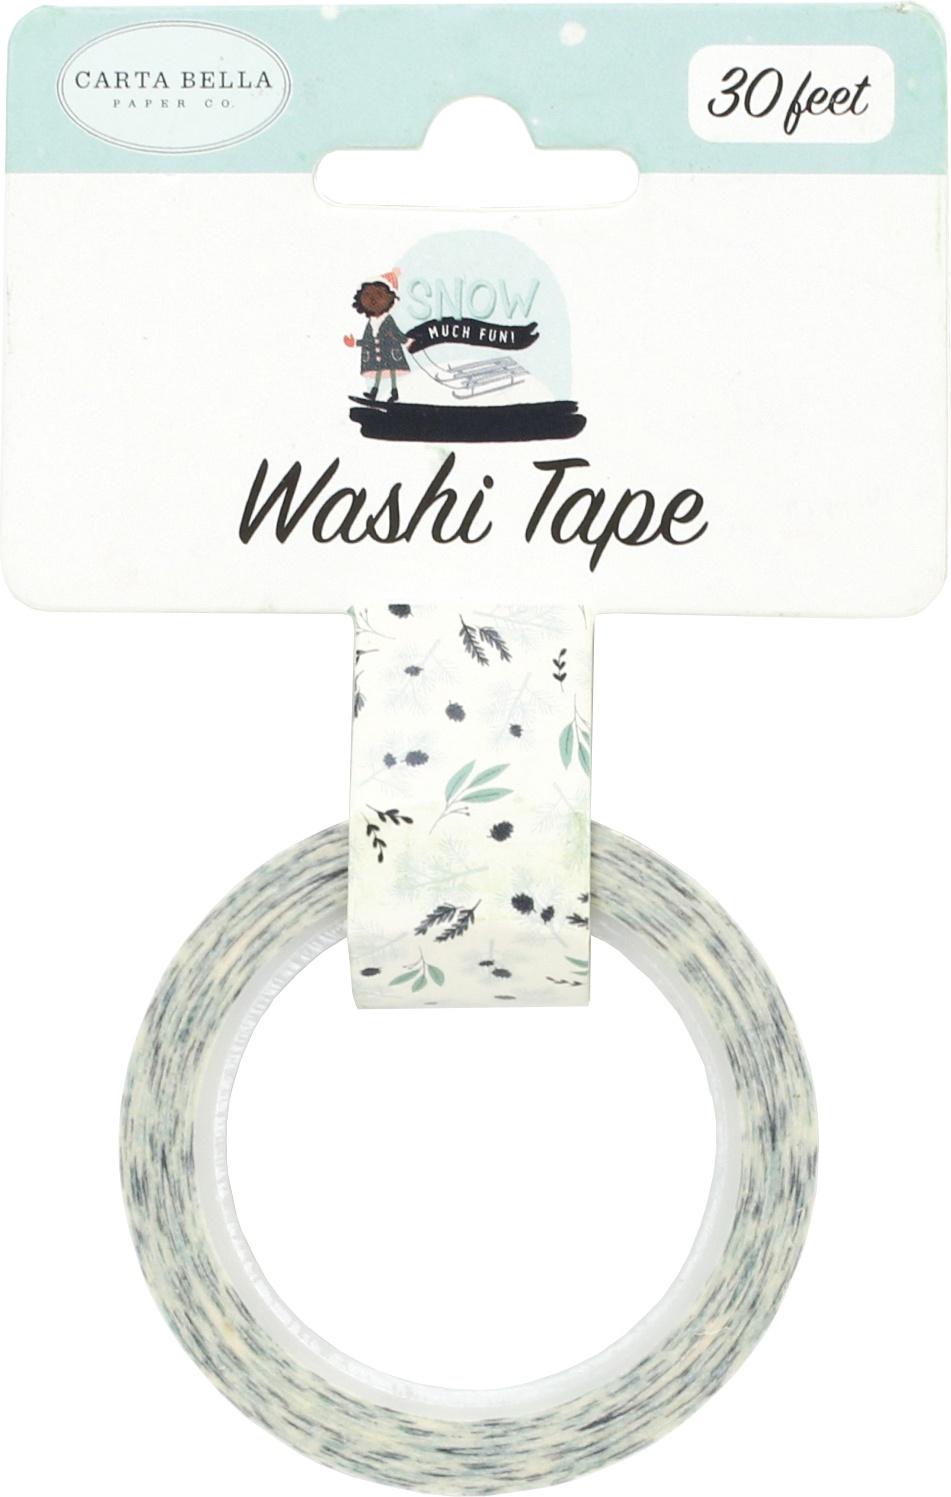 ^Carta Bella - Washi Tape - Snowy Pines